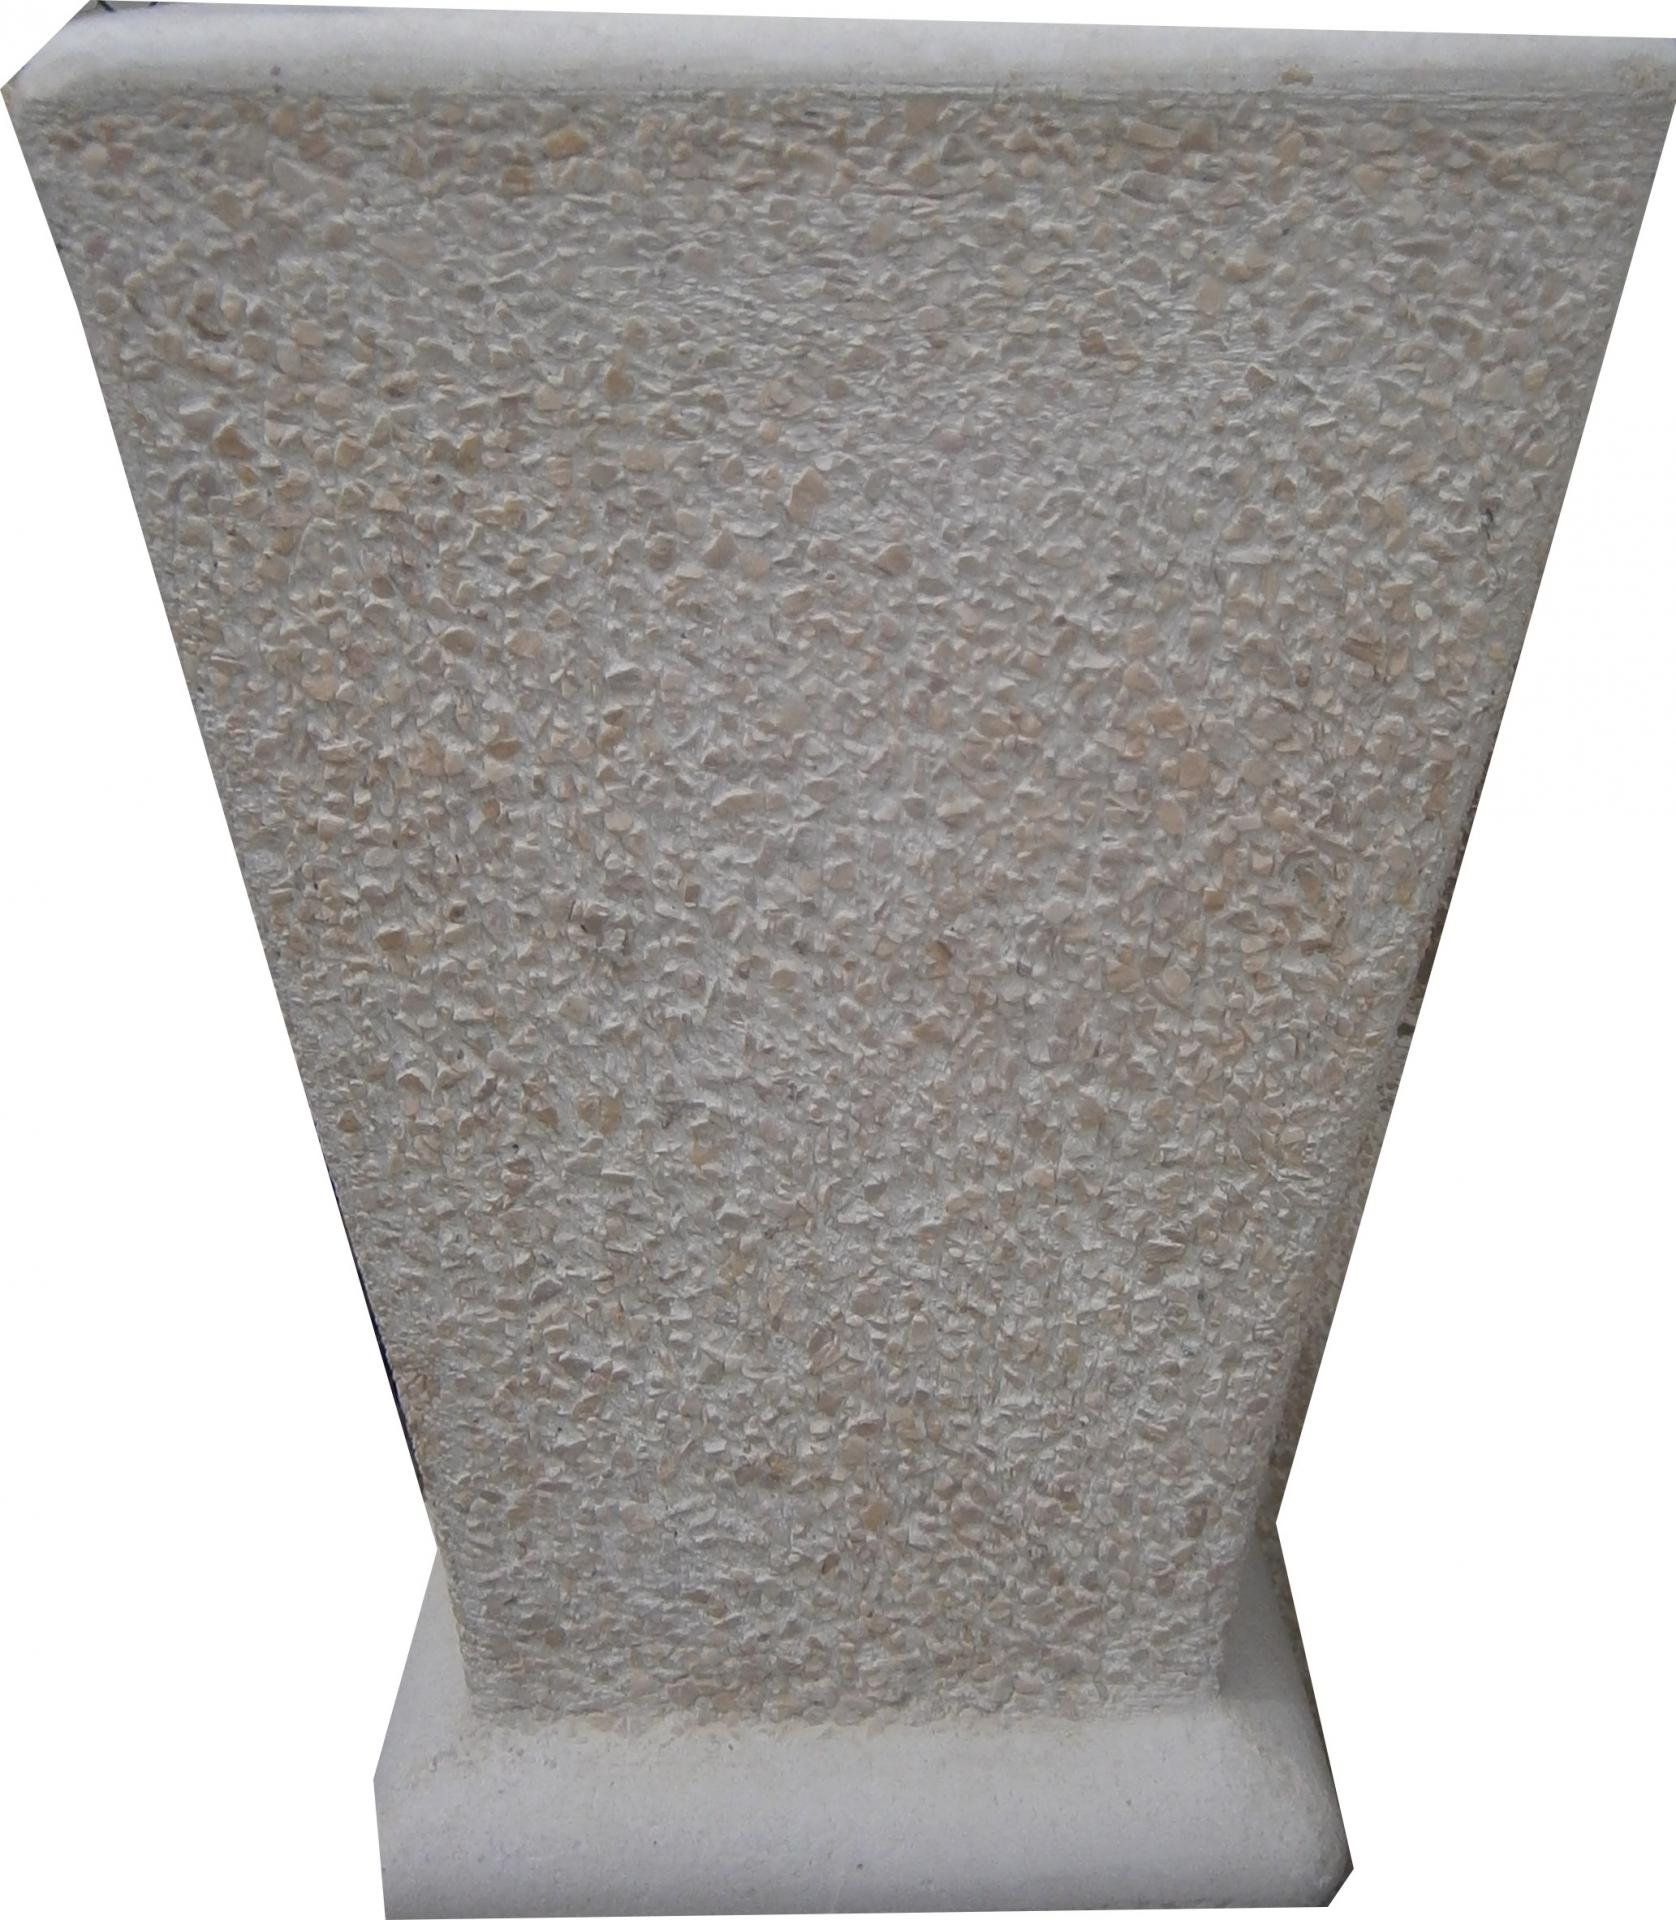 P5270553